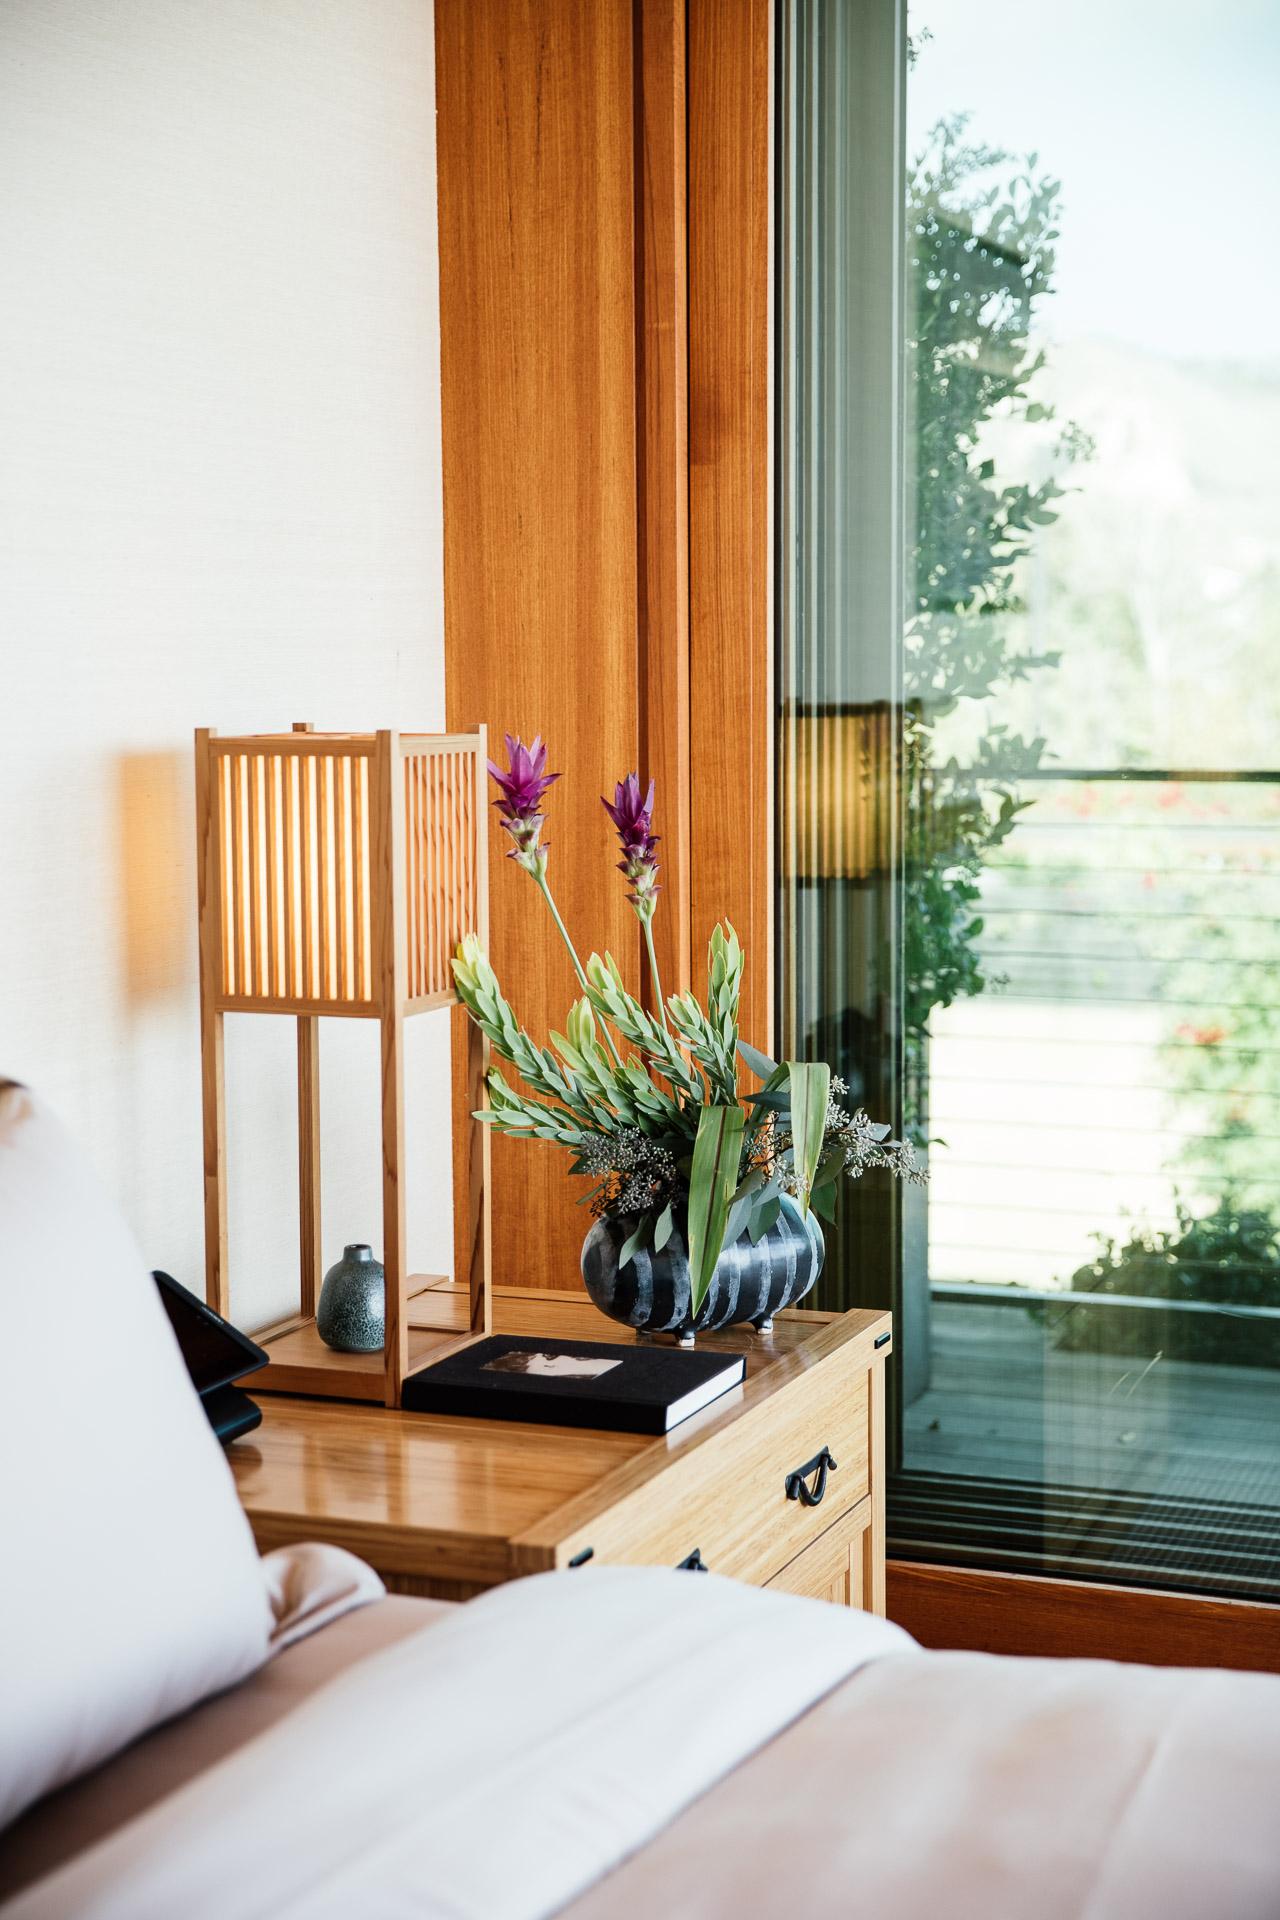 nobu-ryokan-malibu-california-luxury-hotel-photographer-los-angeles-5.jpg